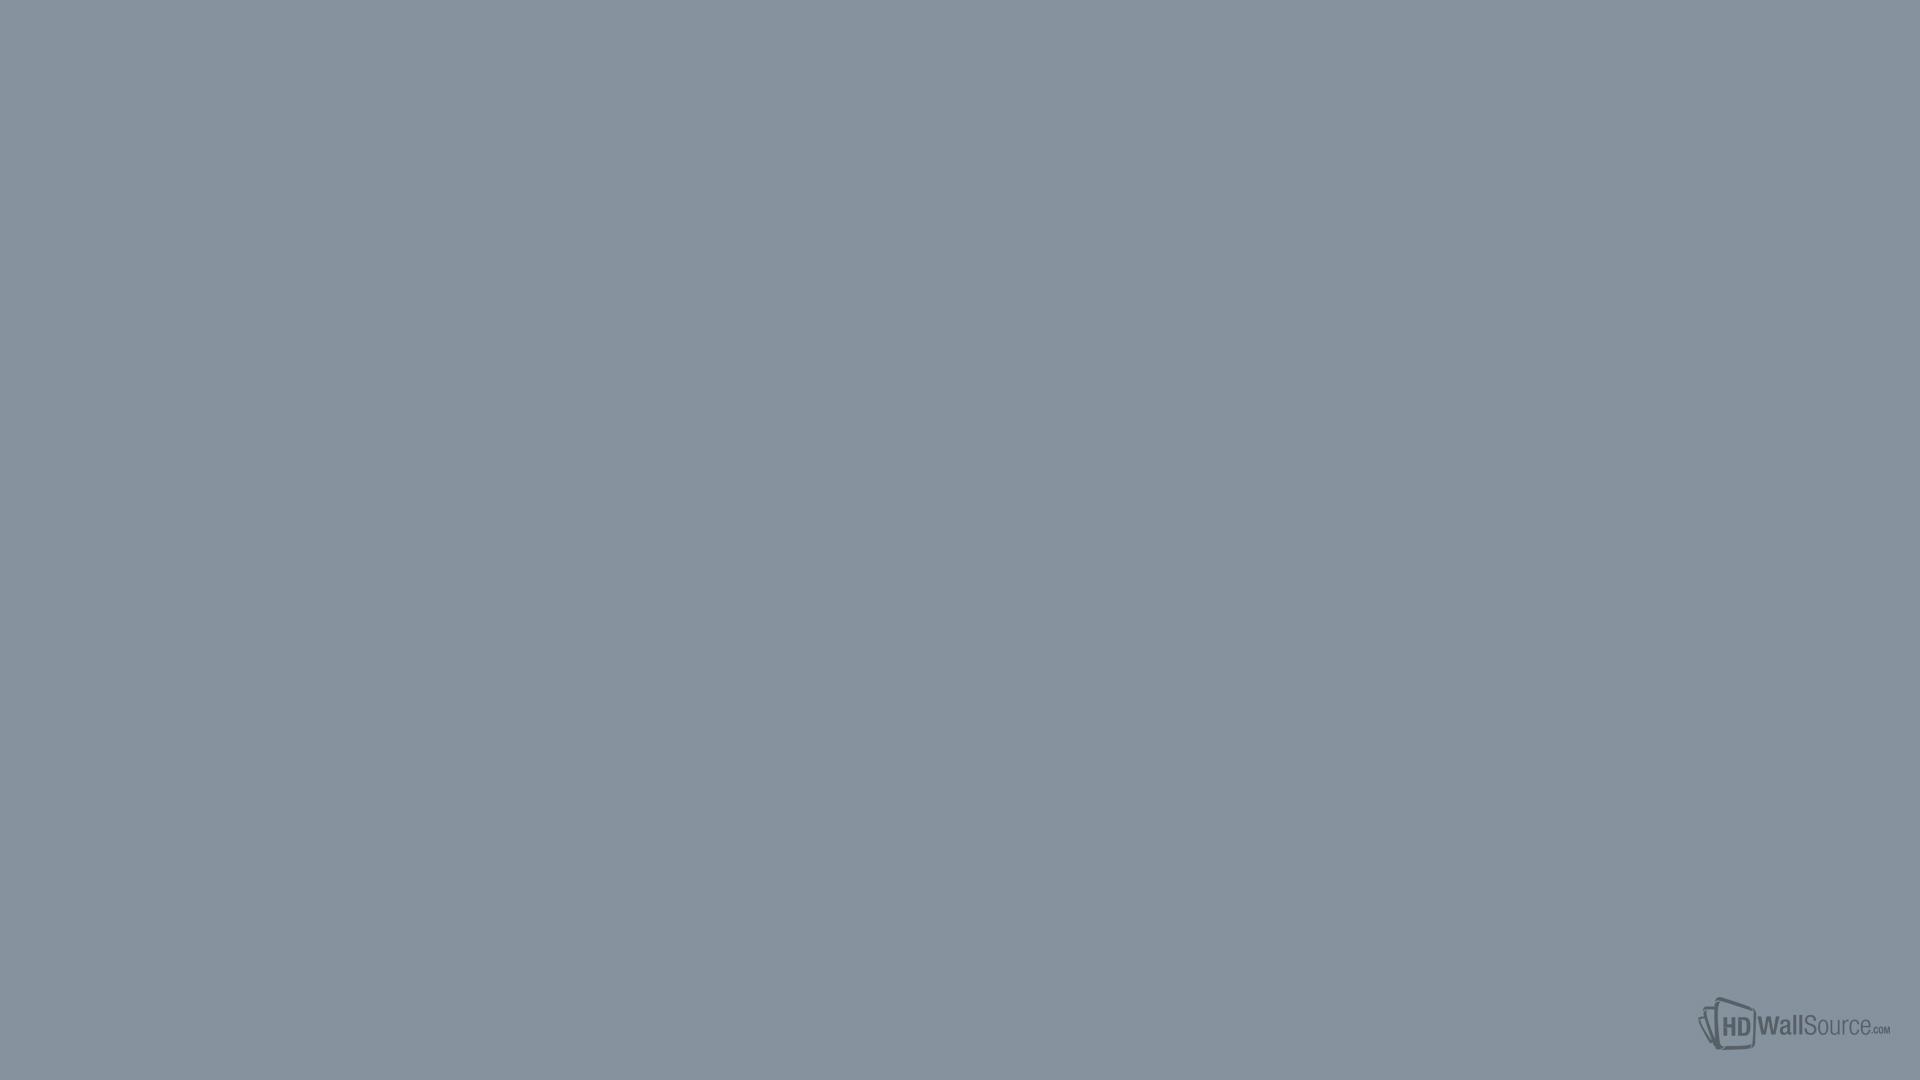 85929e wallpaper 70943